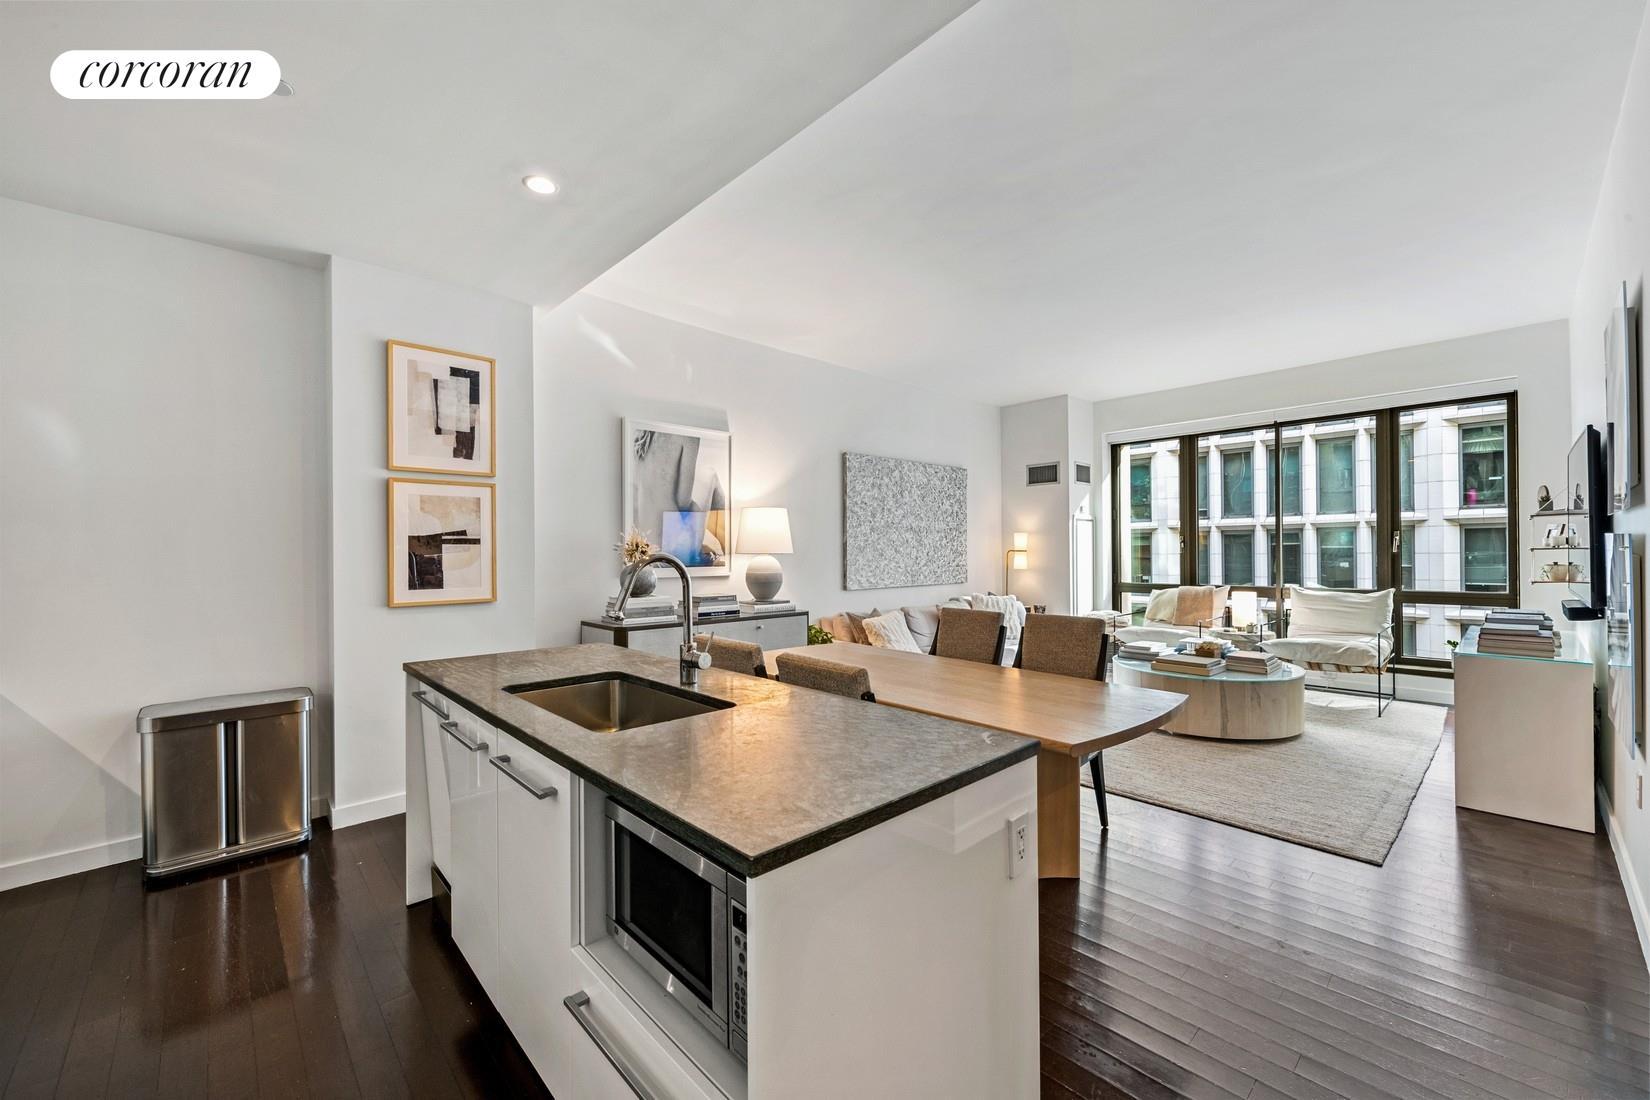 4 West 21st Street Flatiron District New York NY 10010